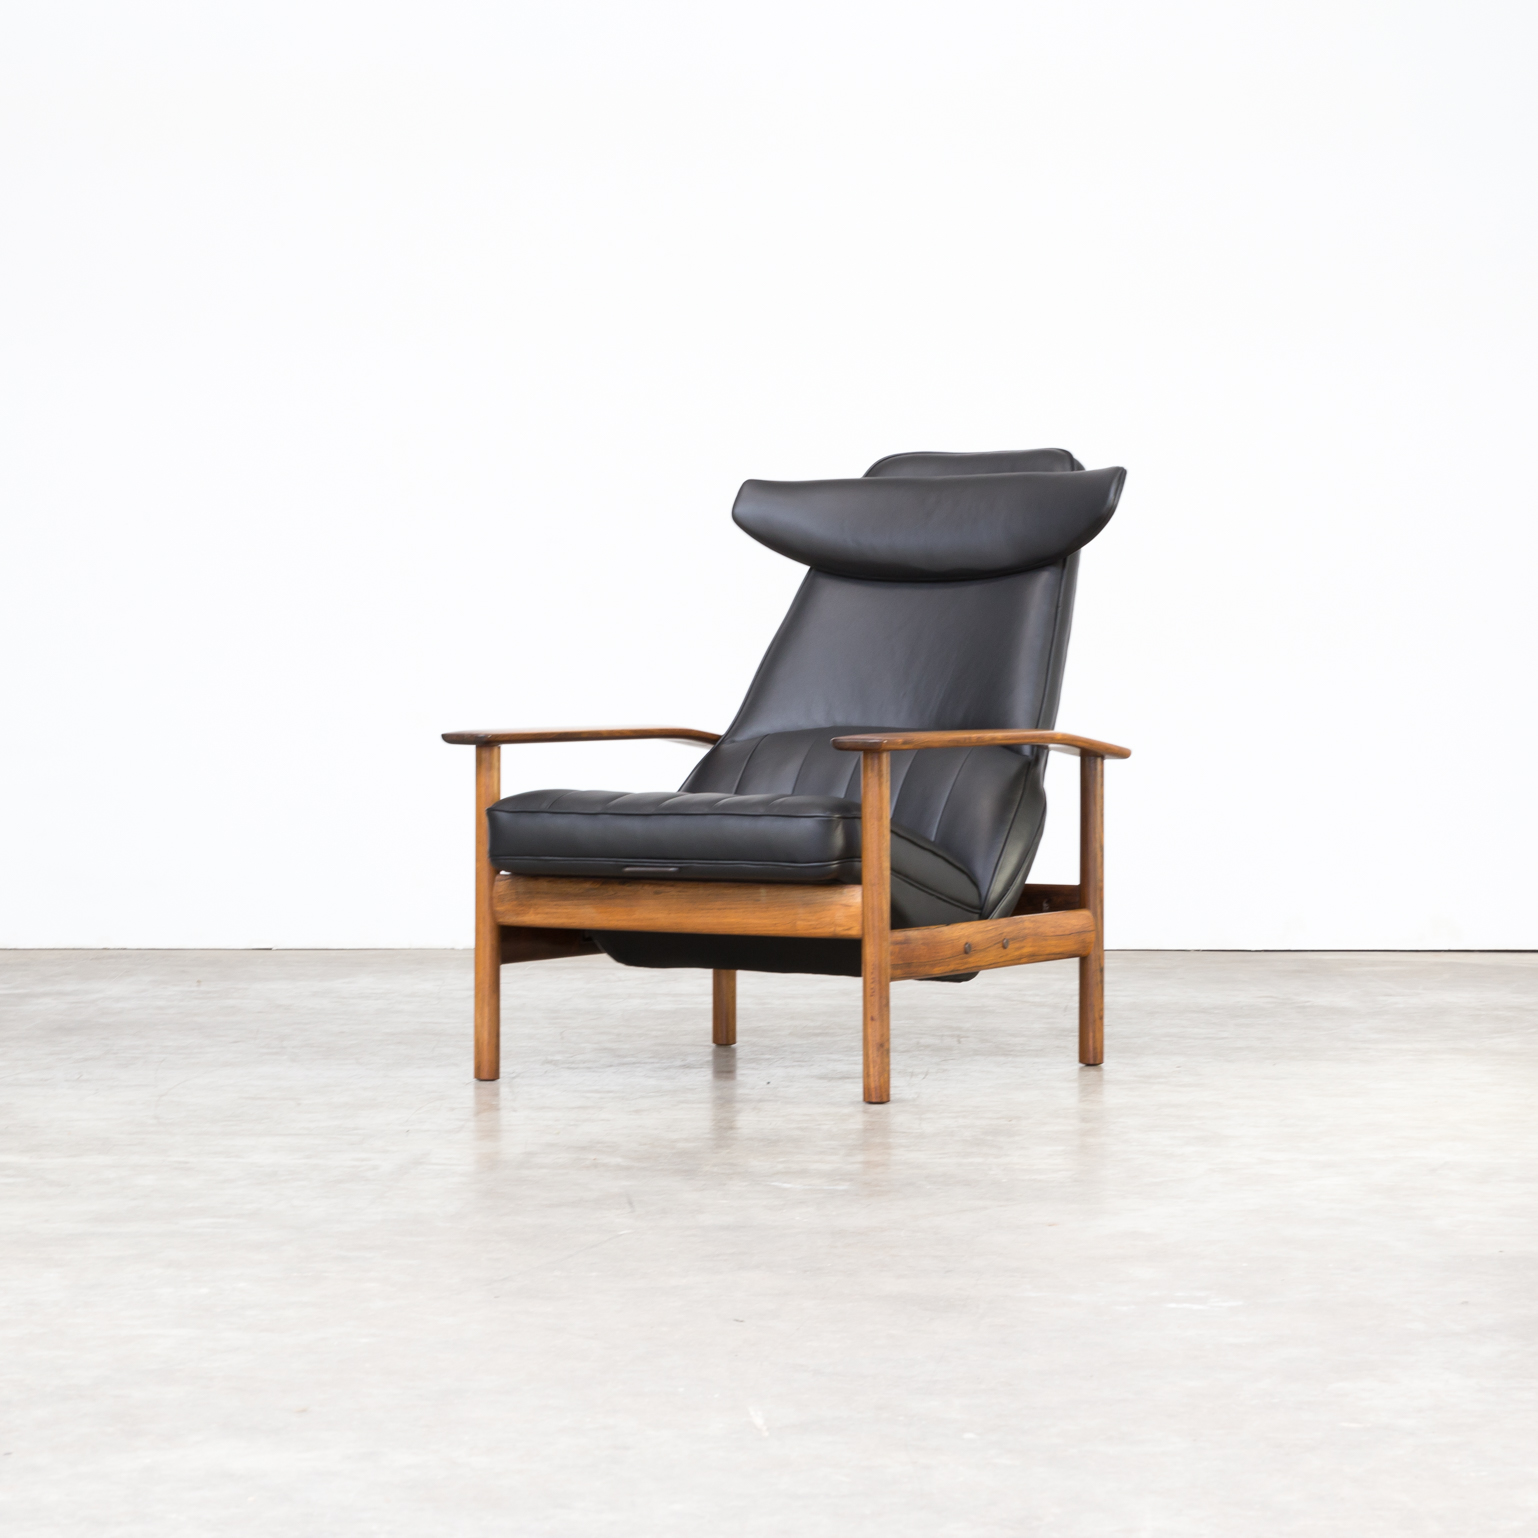 0503108ZF-sven-ivar-dysthe-dokka-mobler-norway-lounge-fauteuil-chairs-relax-restored-upholstered-restaurated-pirelli-vintage-retro-design-barbmama-1-van-15.jpg